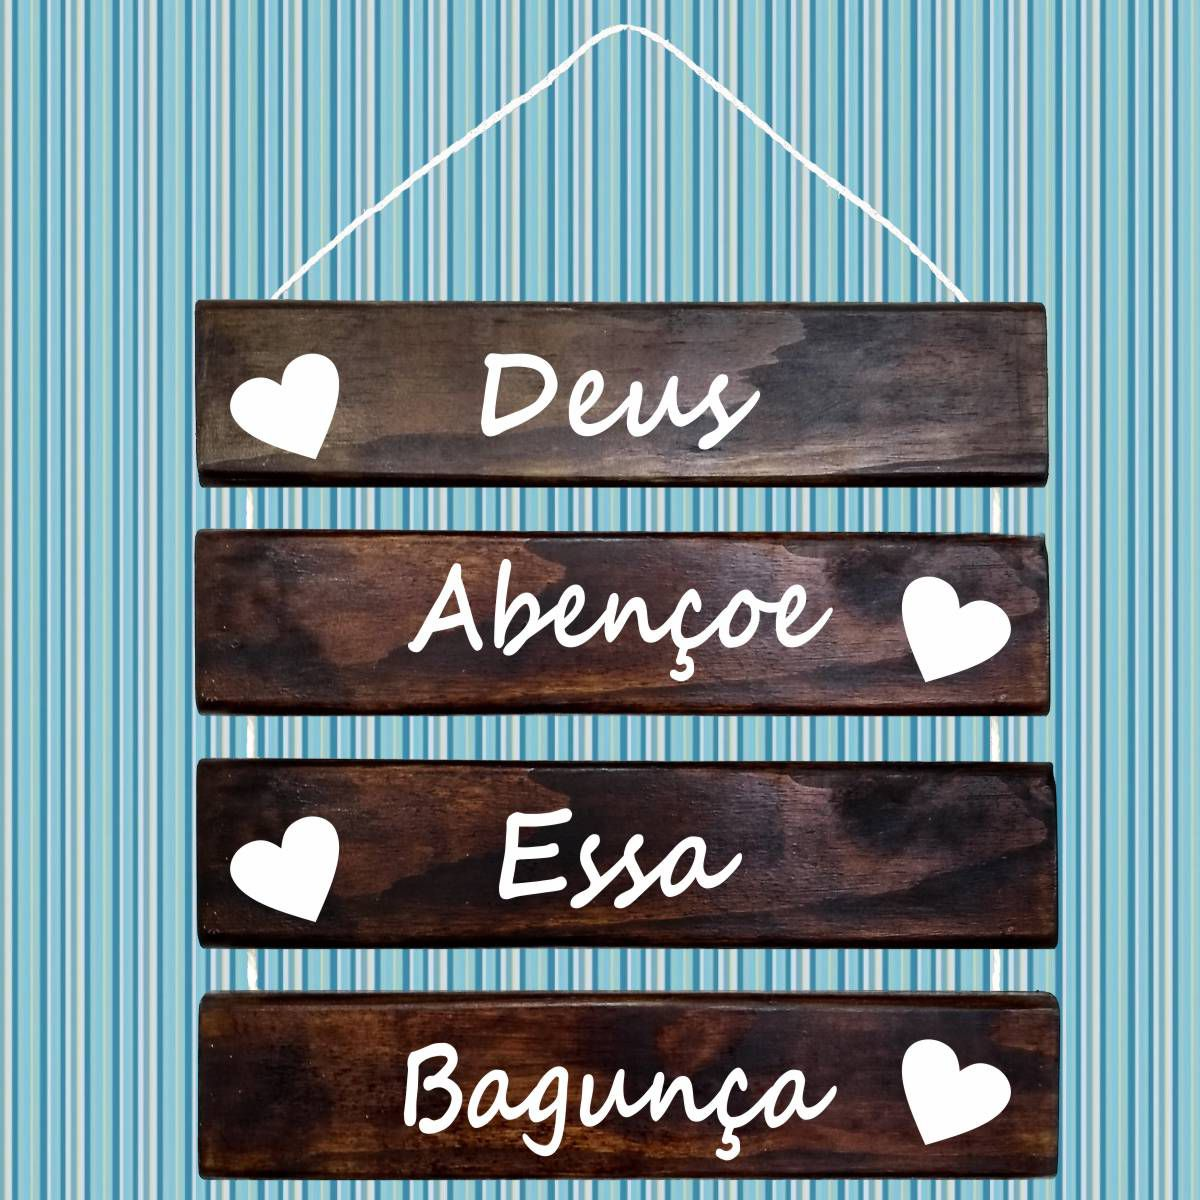 Placa Decorativa Madeira Rústica Corda Sisal Deus Abençoe Essa Bagunça